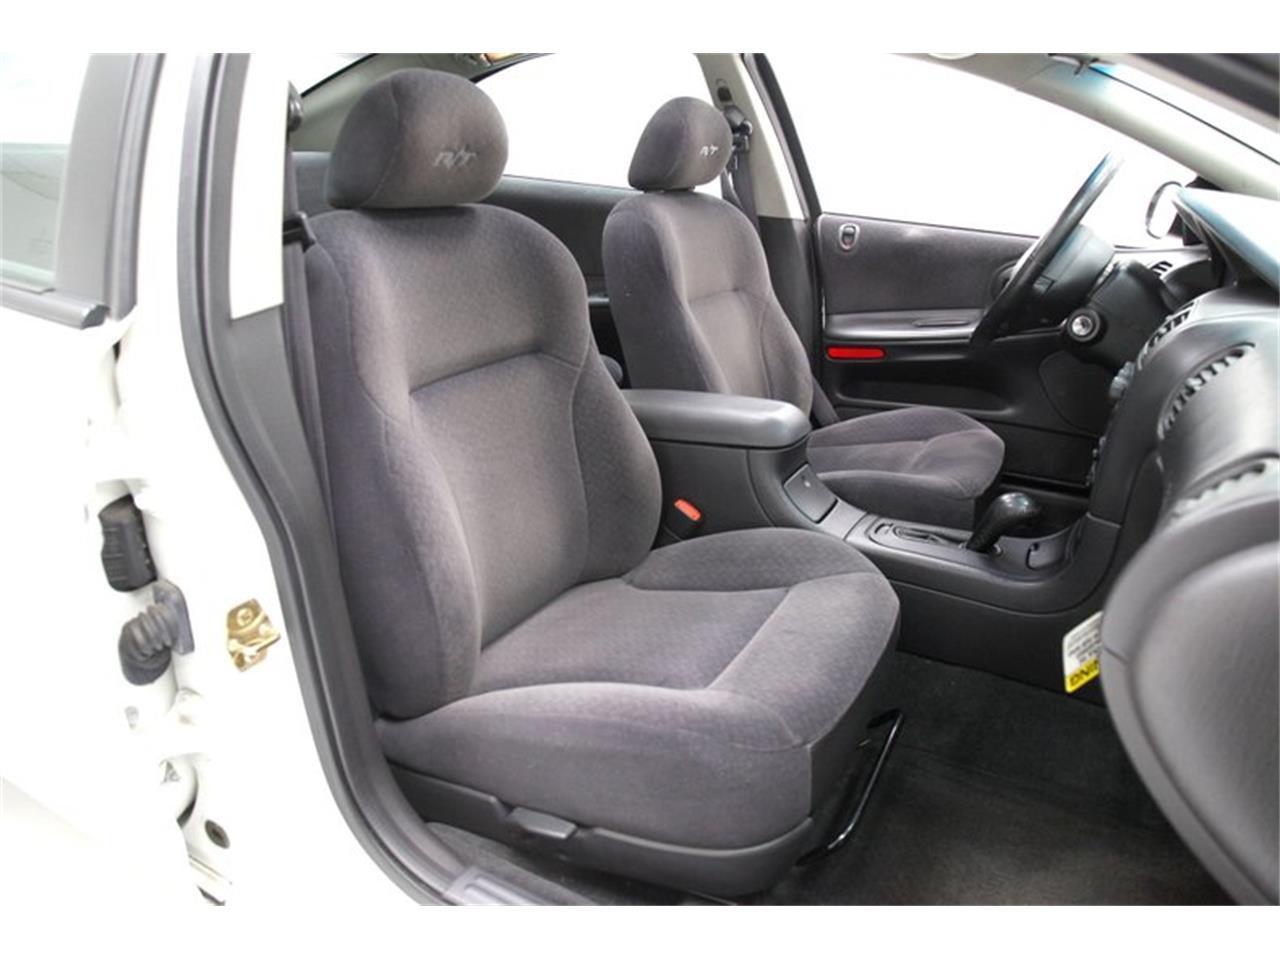 2000 Dodge Intrepid (CC-1418717) for sale in Morgantown, Pennsylvania